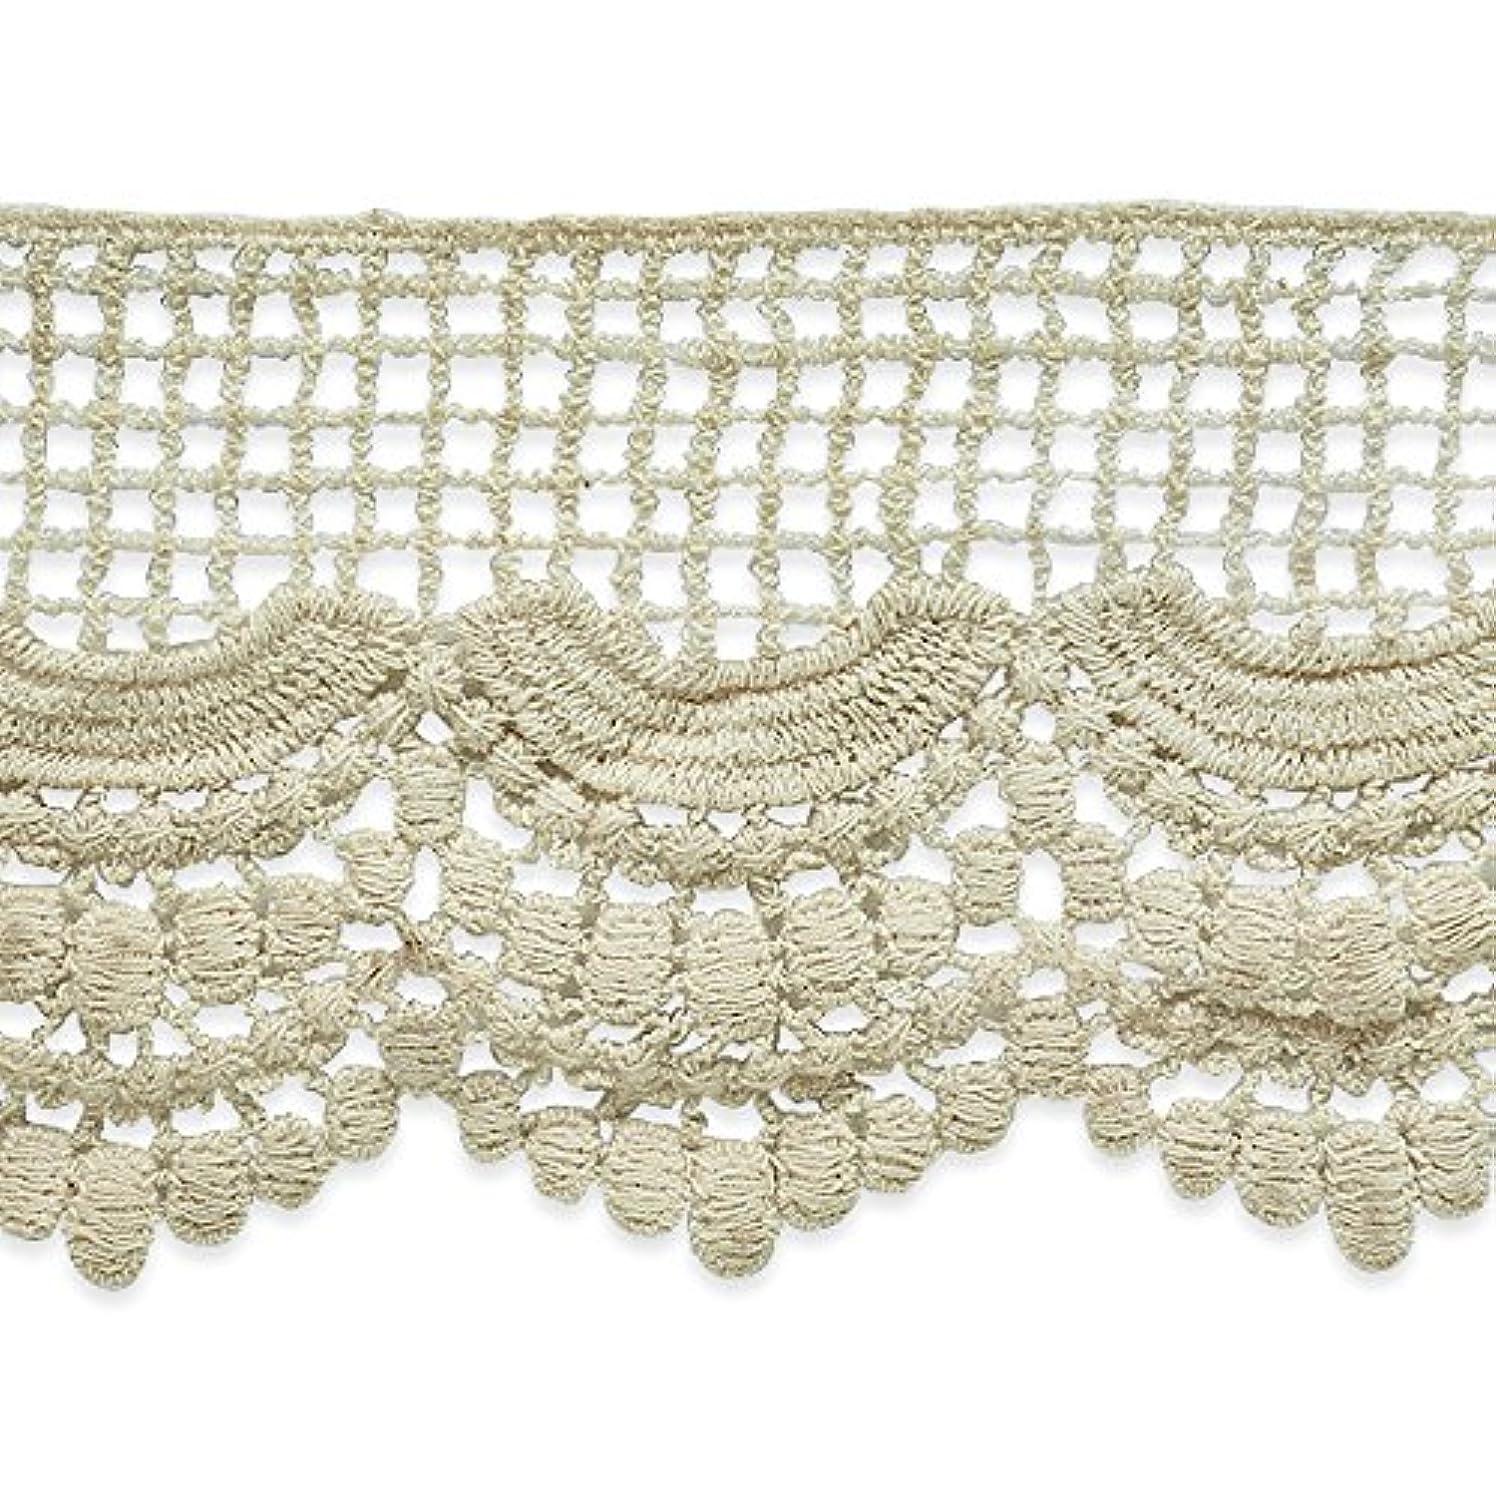 Expo International Janice Cotton Lace Trim, 14 yd/3 1/2